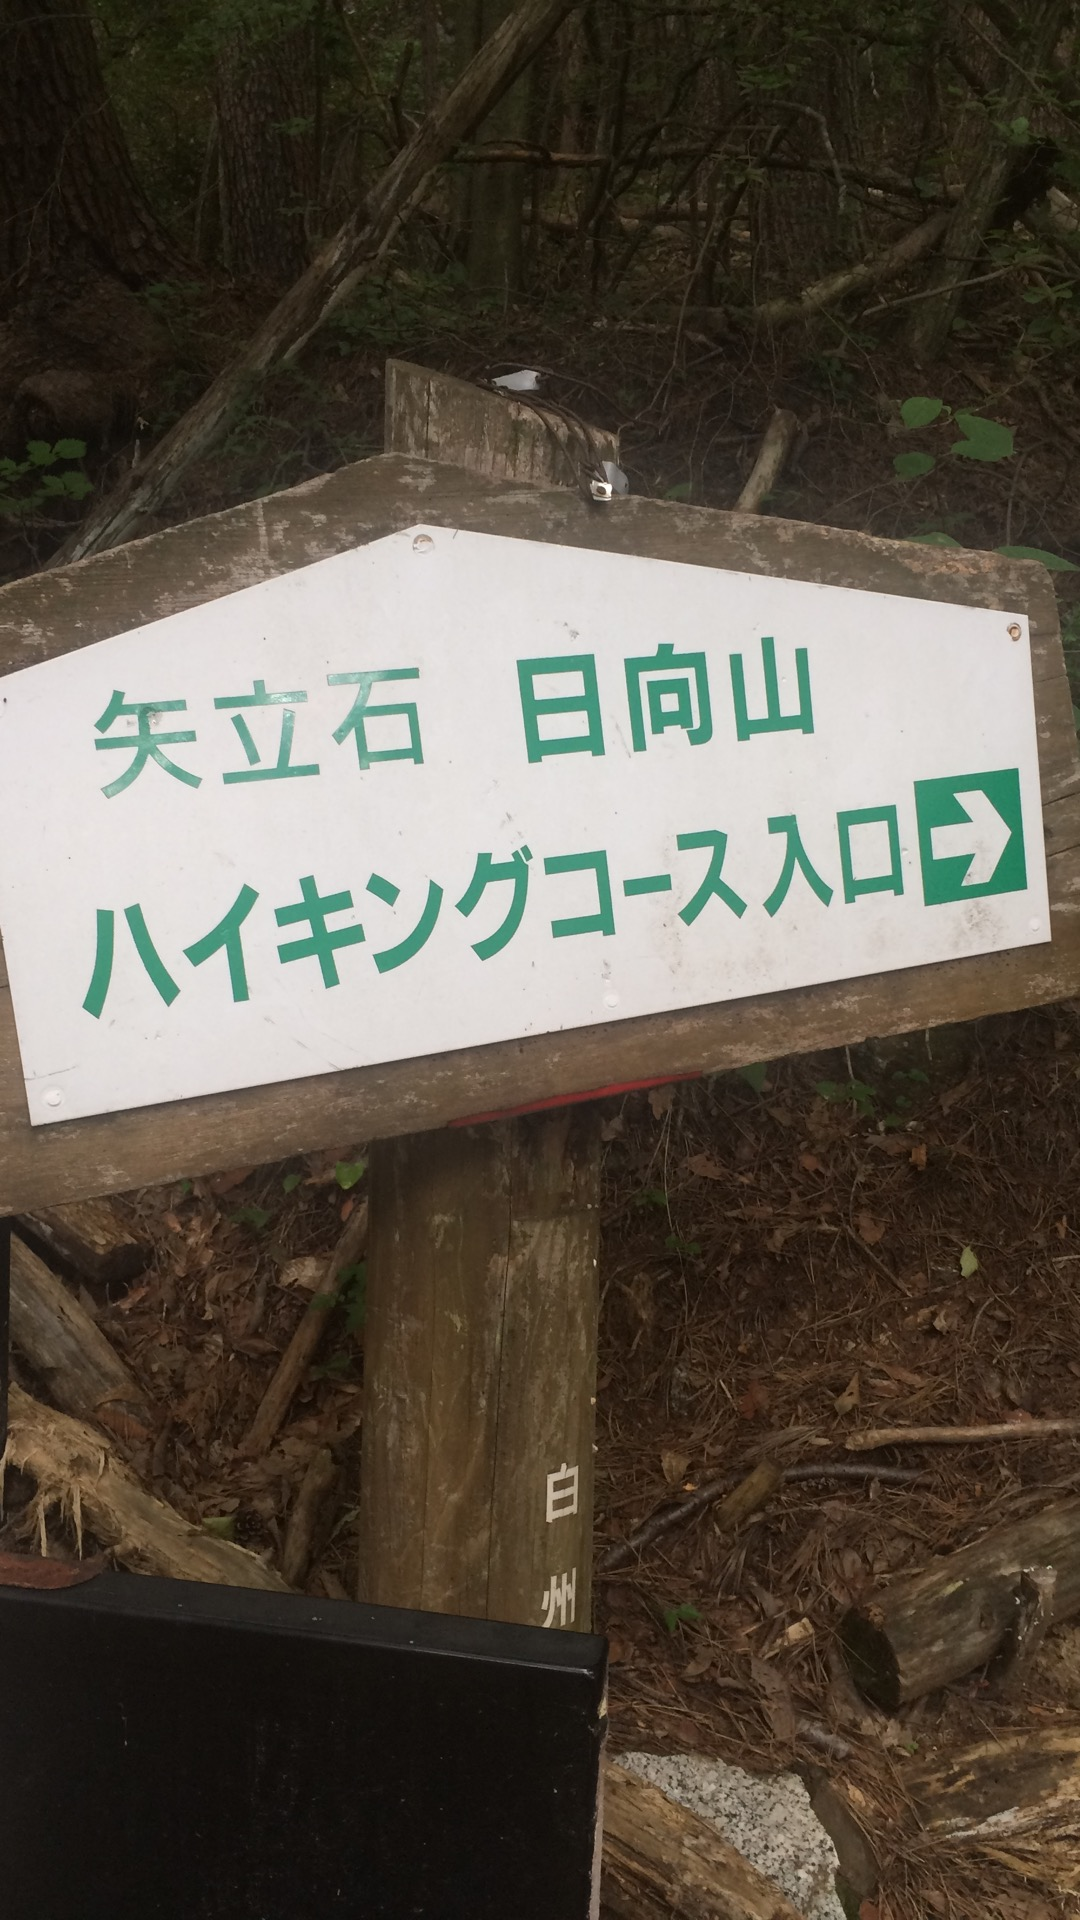 http://www.yamanashi-kankou.jp/blog/%E7%9C%8B%E6%9D%BF.jpg